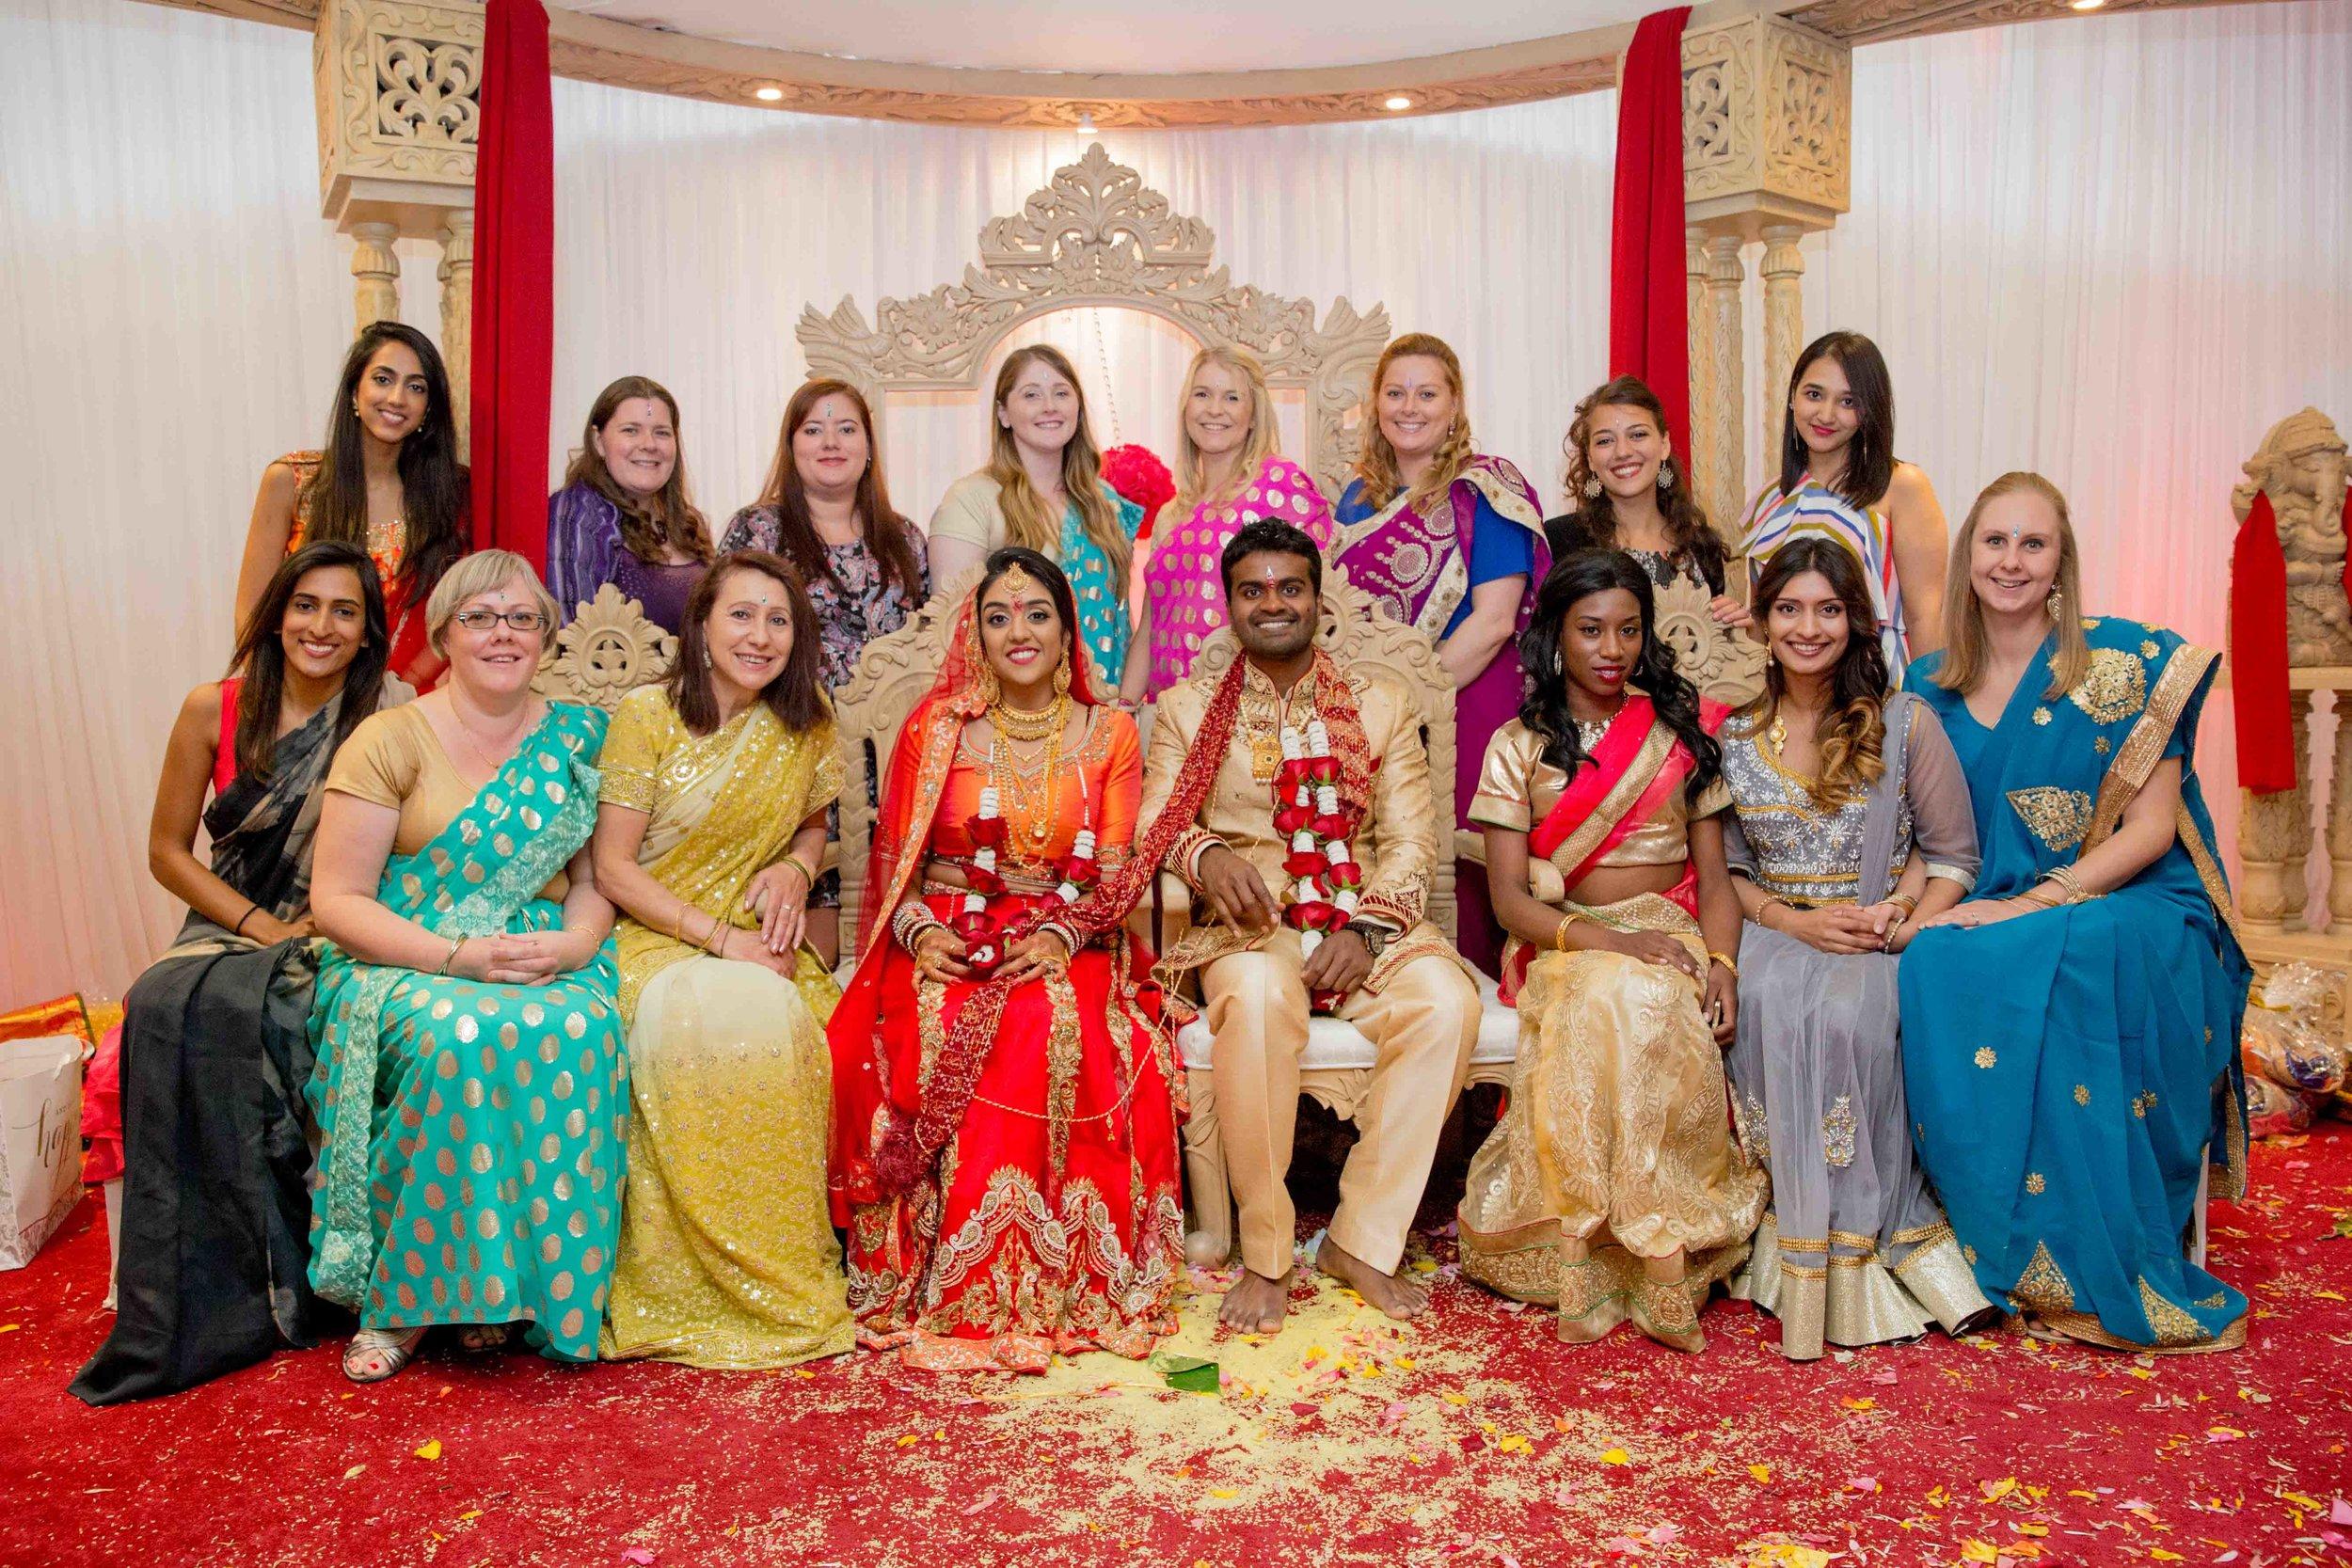 premier-banquetting-london-Hindu-asian-wedding-photographer-natalia-smith-photography-41.jpg